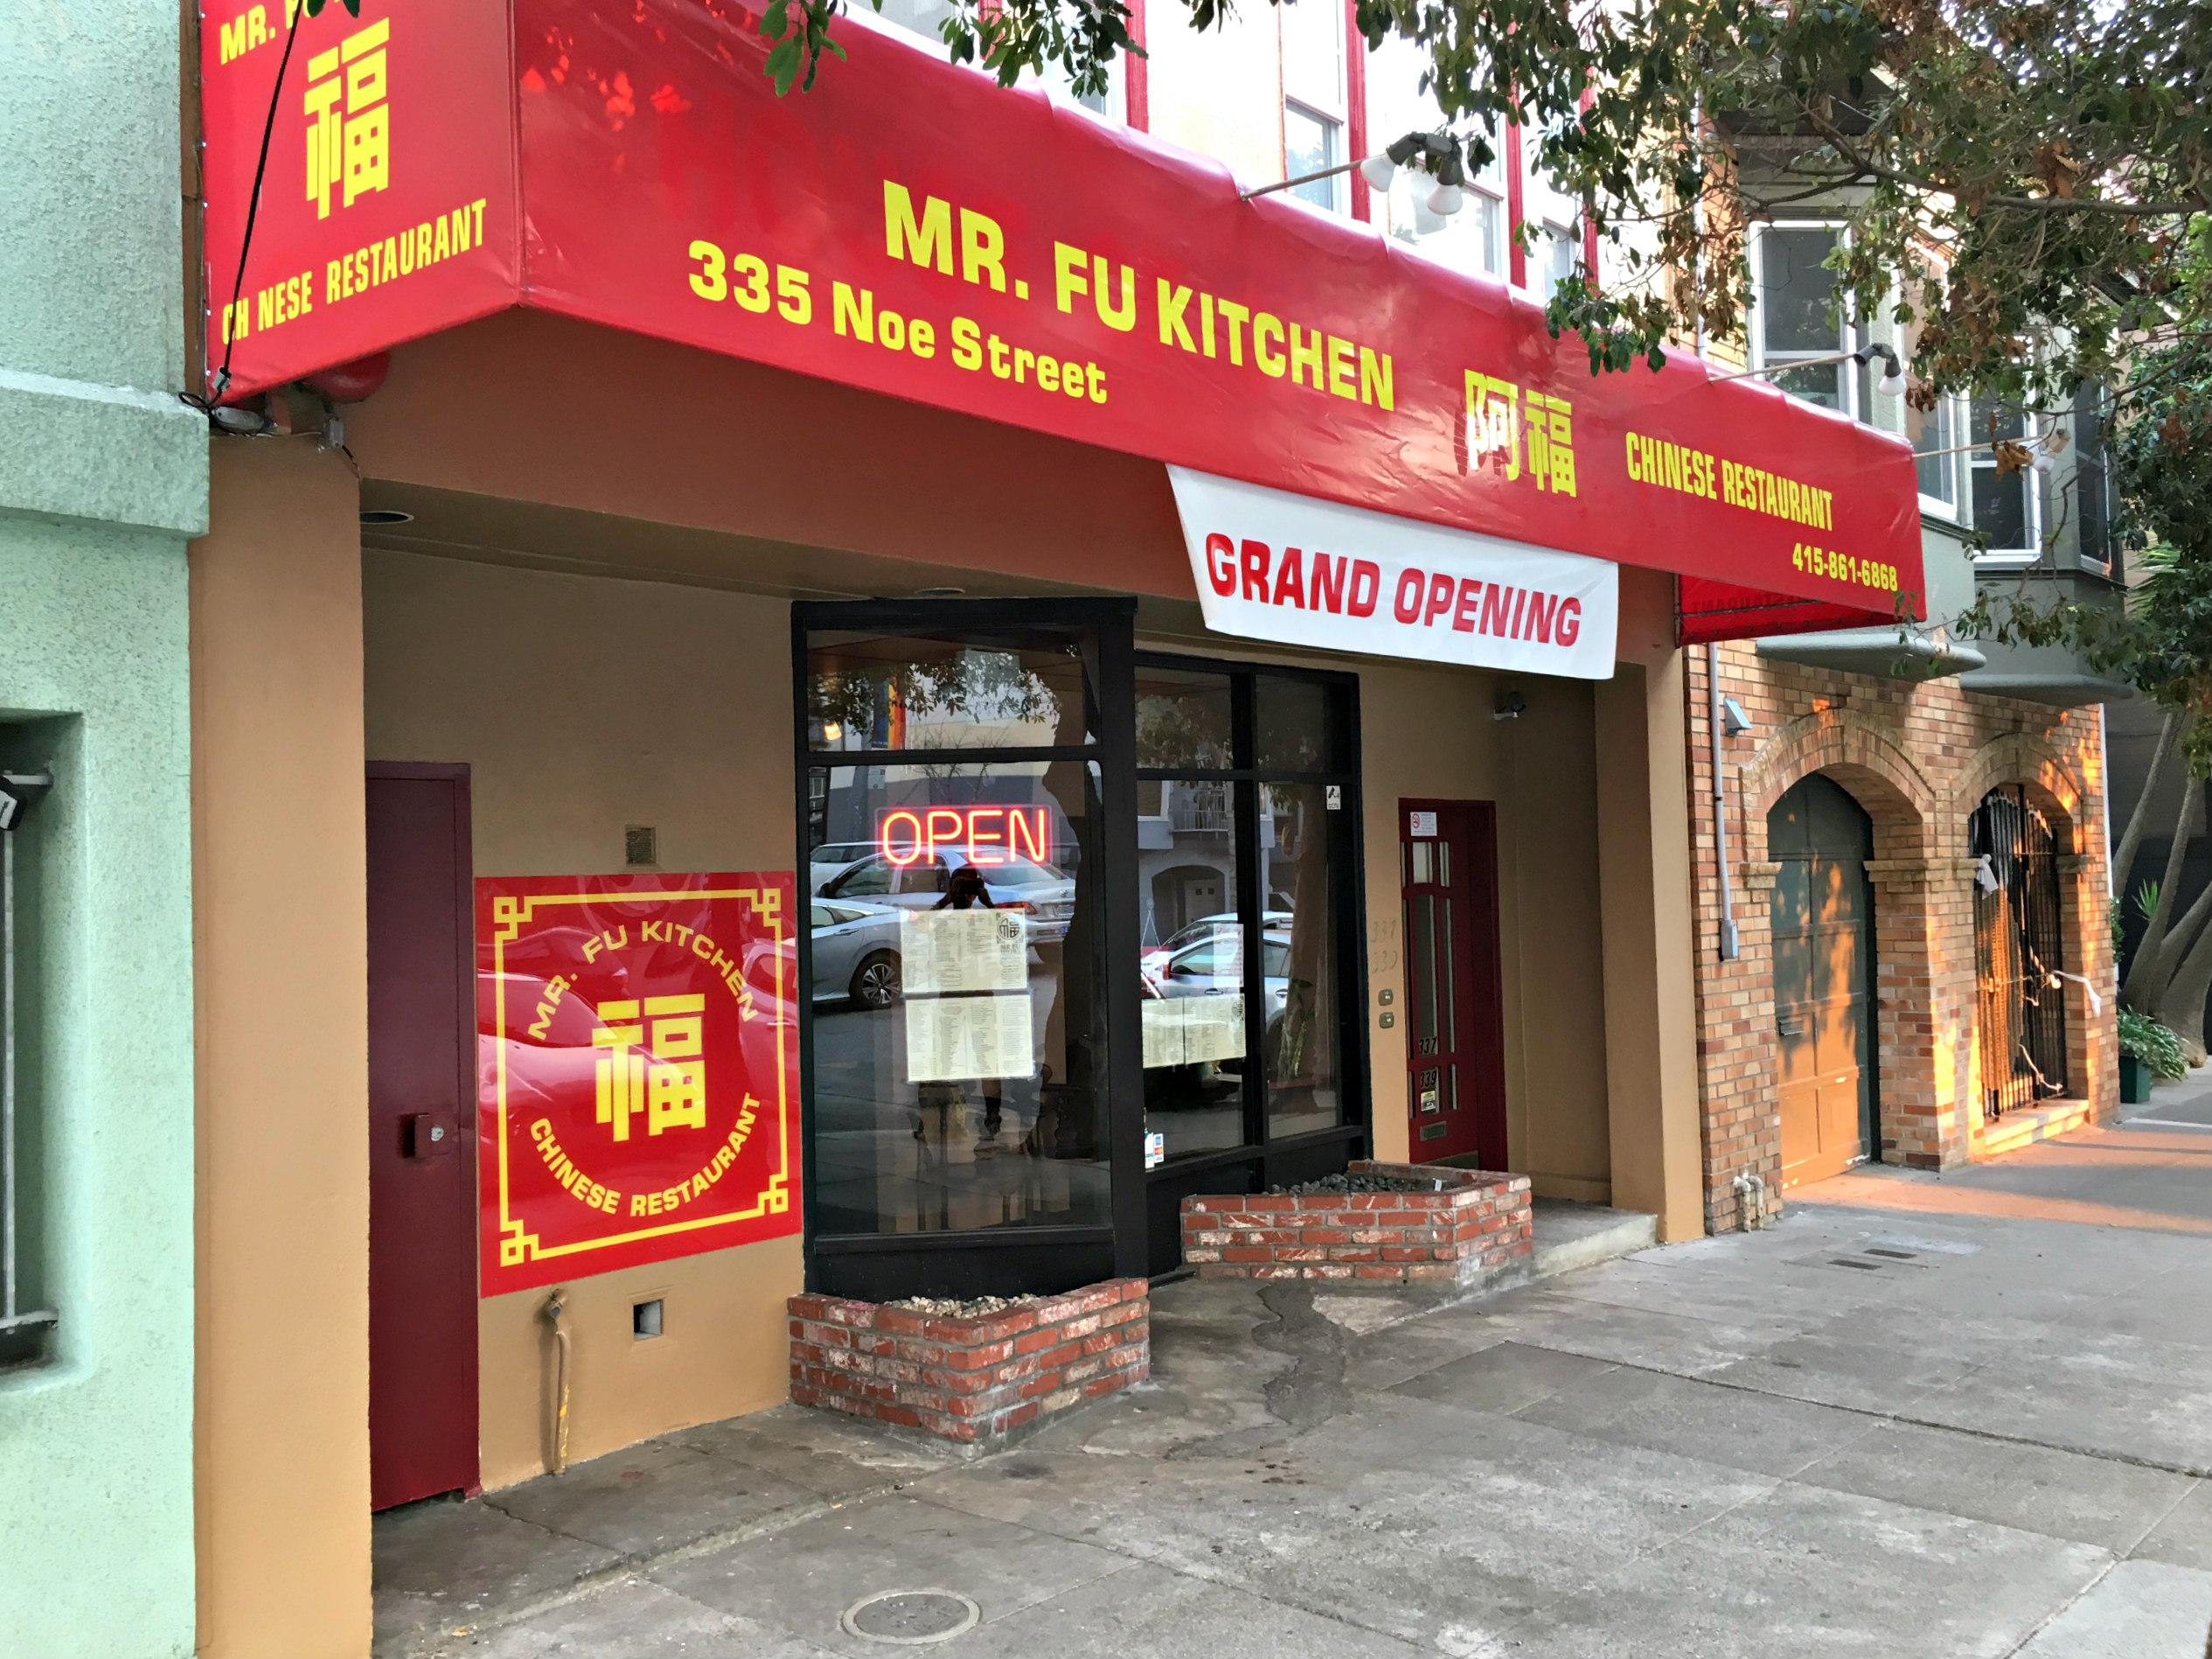 Mr Fu Kitchen Brings Chinese Cuisine Back To Noe Street